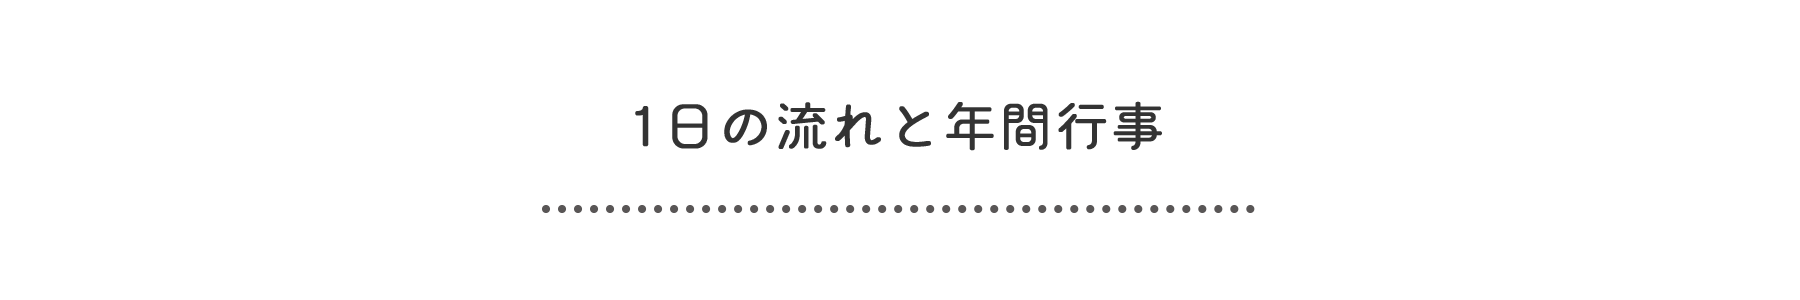 title_1日の流れ